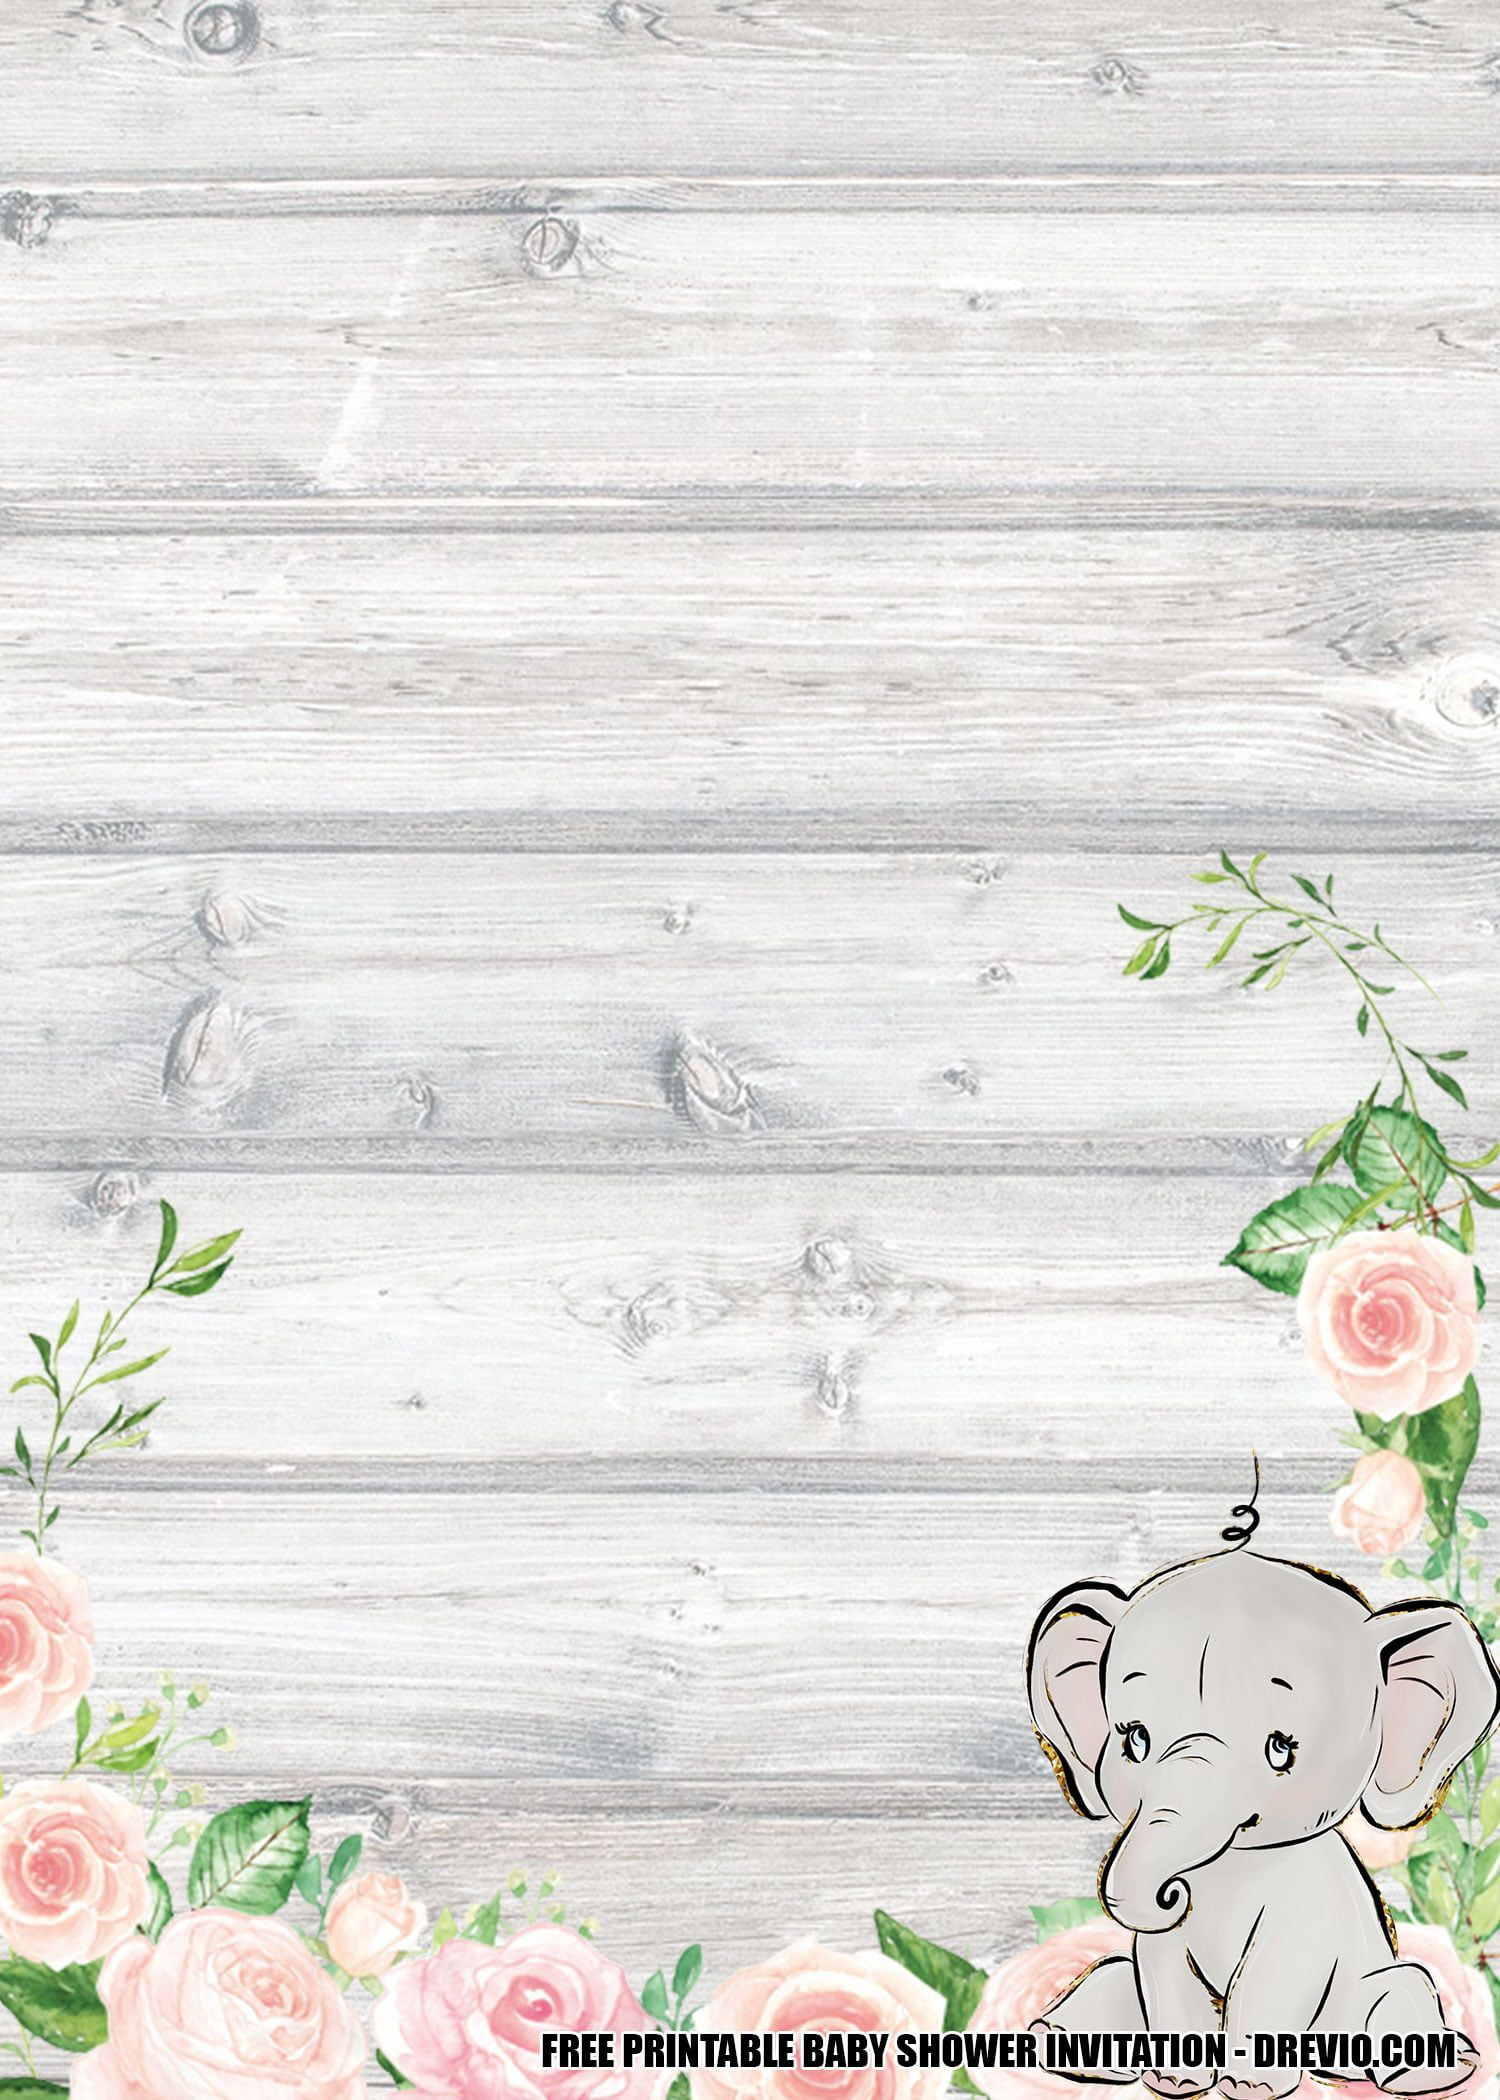 008 Wonderful Free Printable Elephant Baby Shower Invitation Template High Resolution  Templates EditableFull